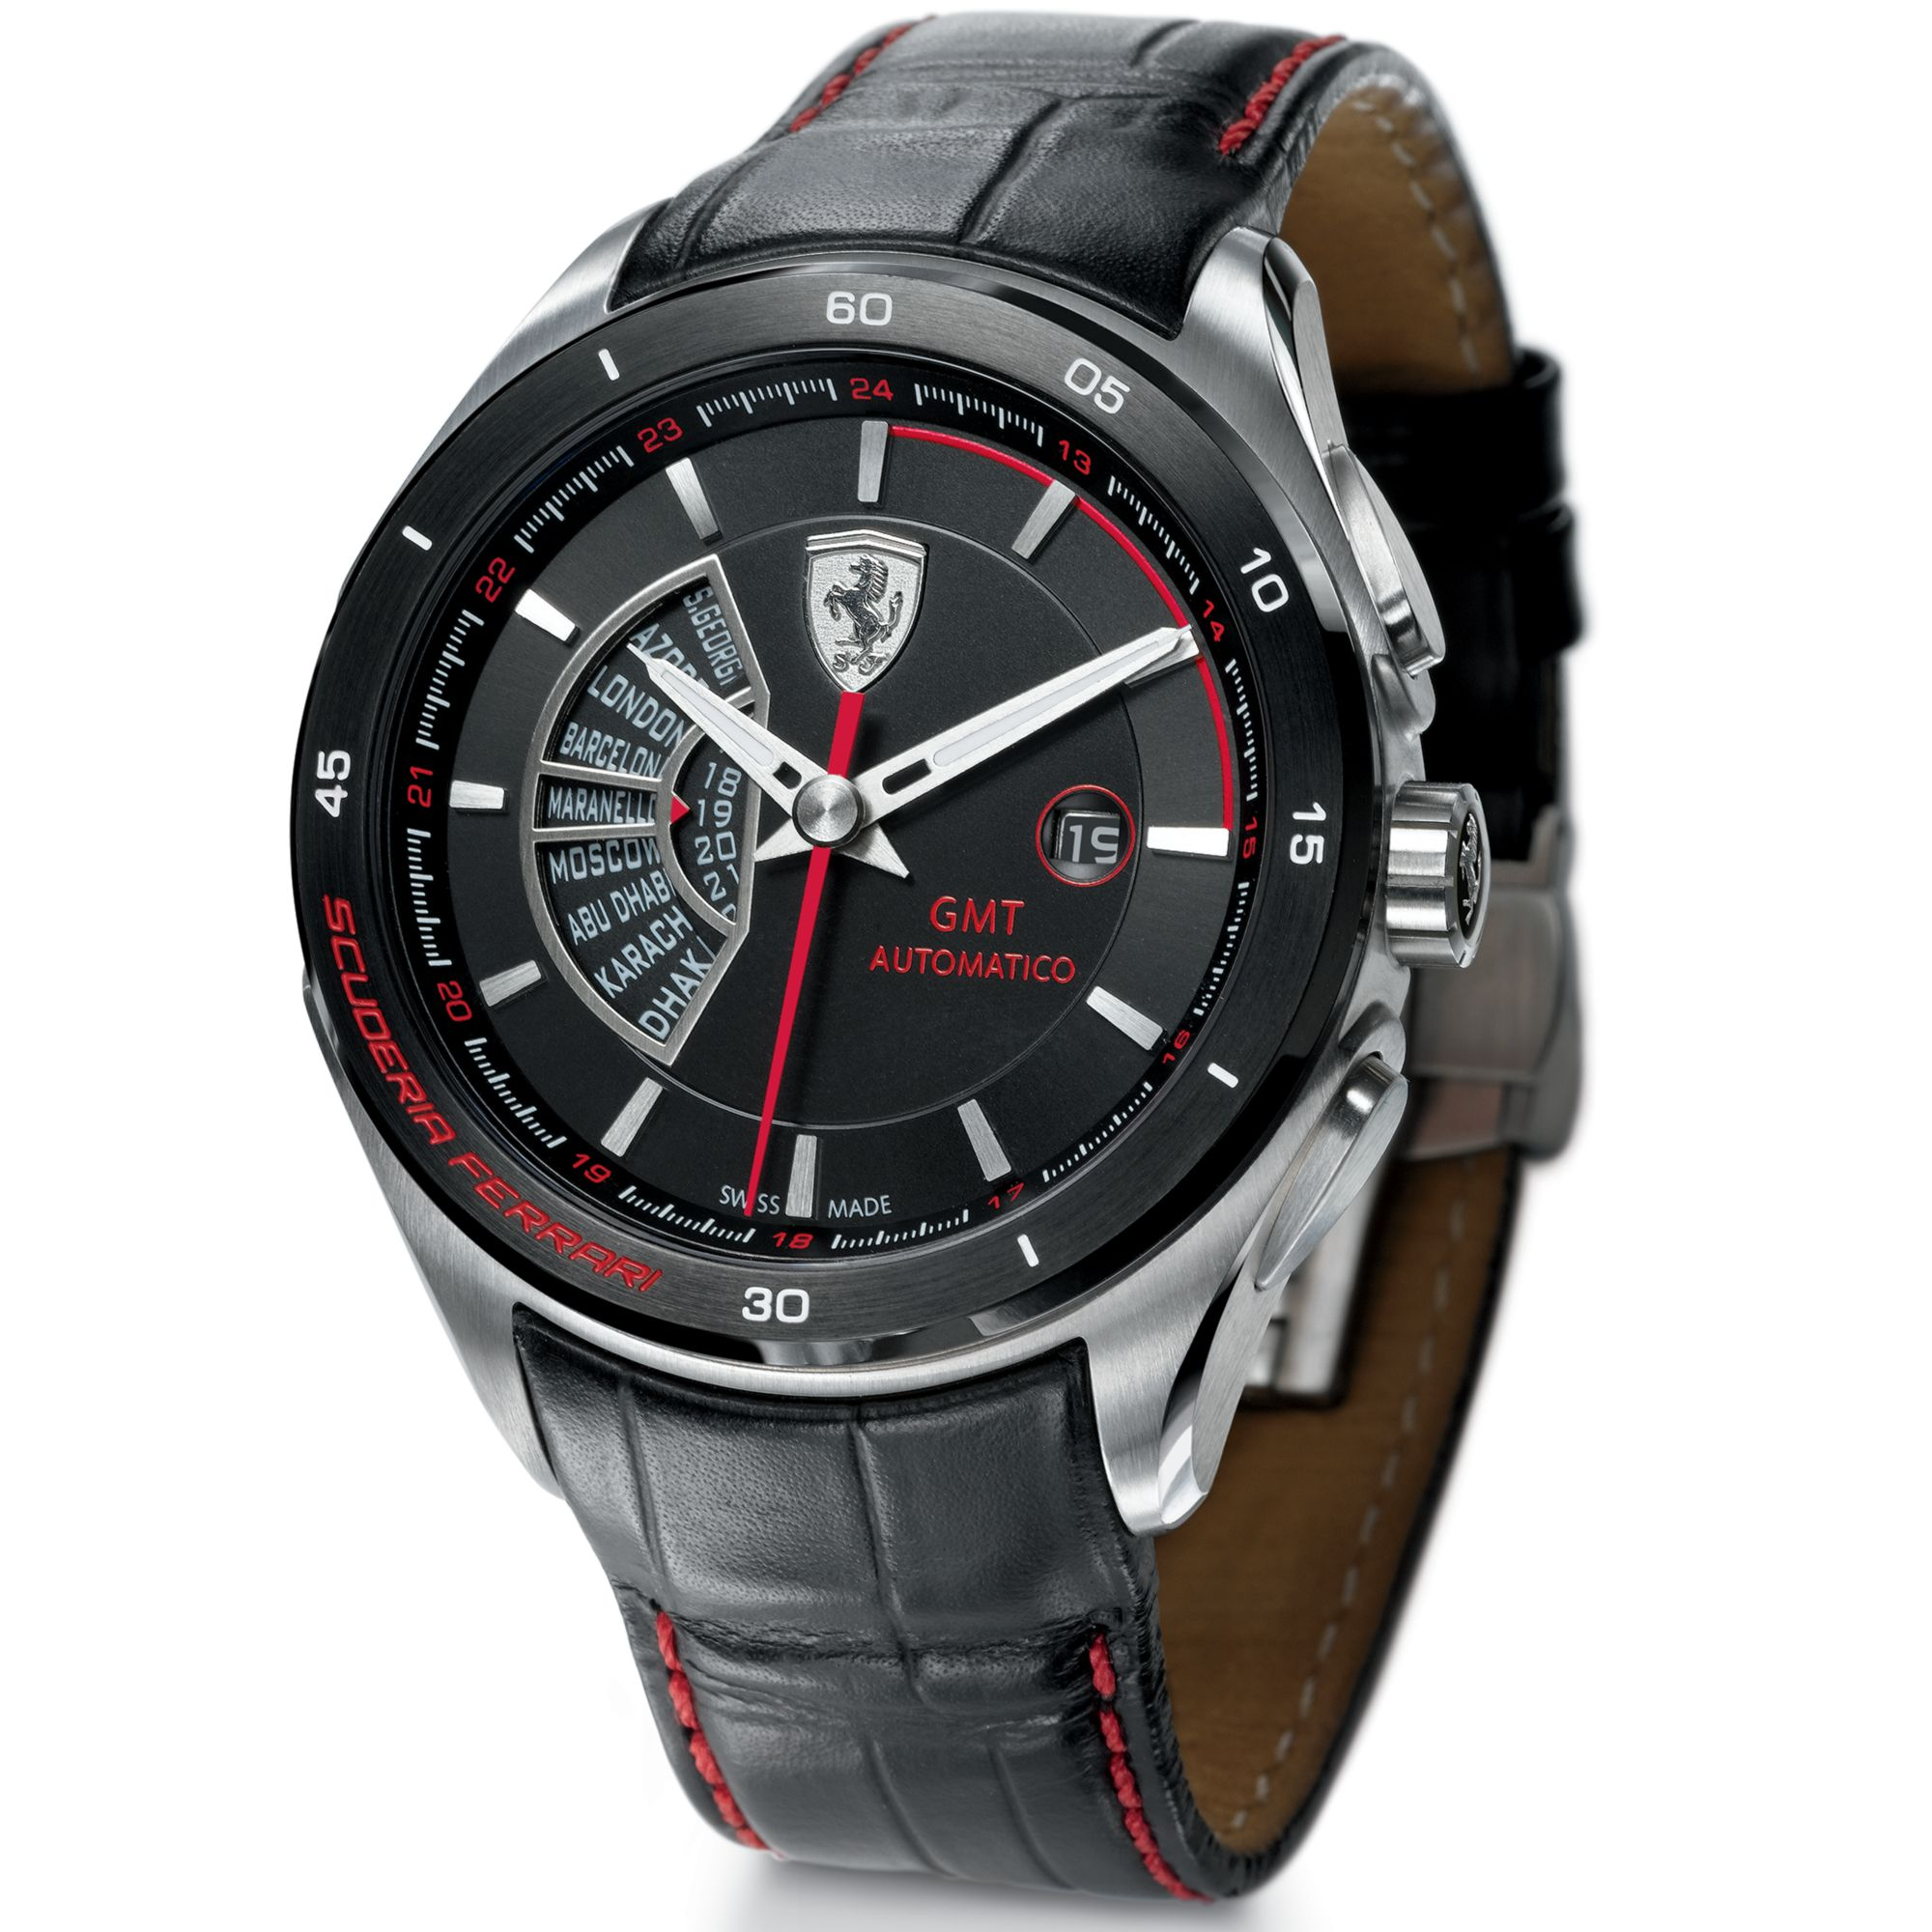 wcs redrev for brand ferrari sale en watches thebay s main hei webapp mens men analog watch accessories stores fit jewellery servlet wid pdplarge